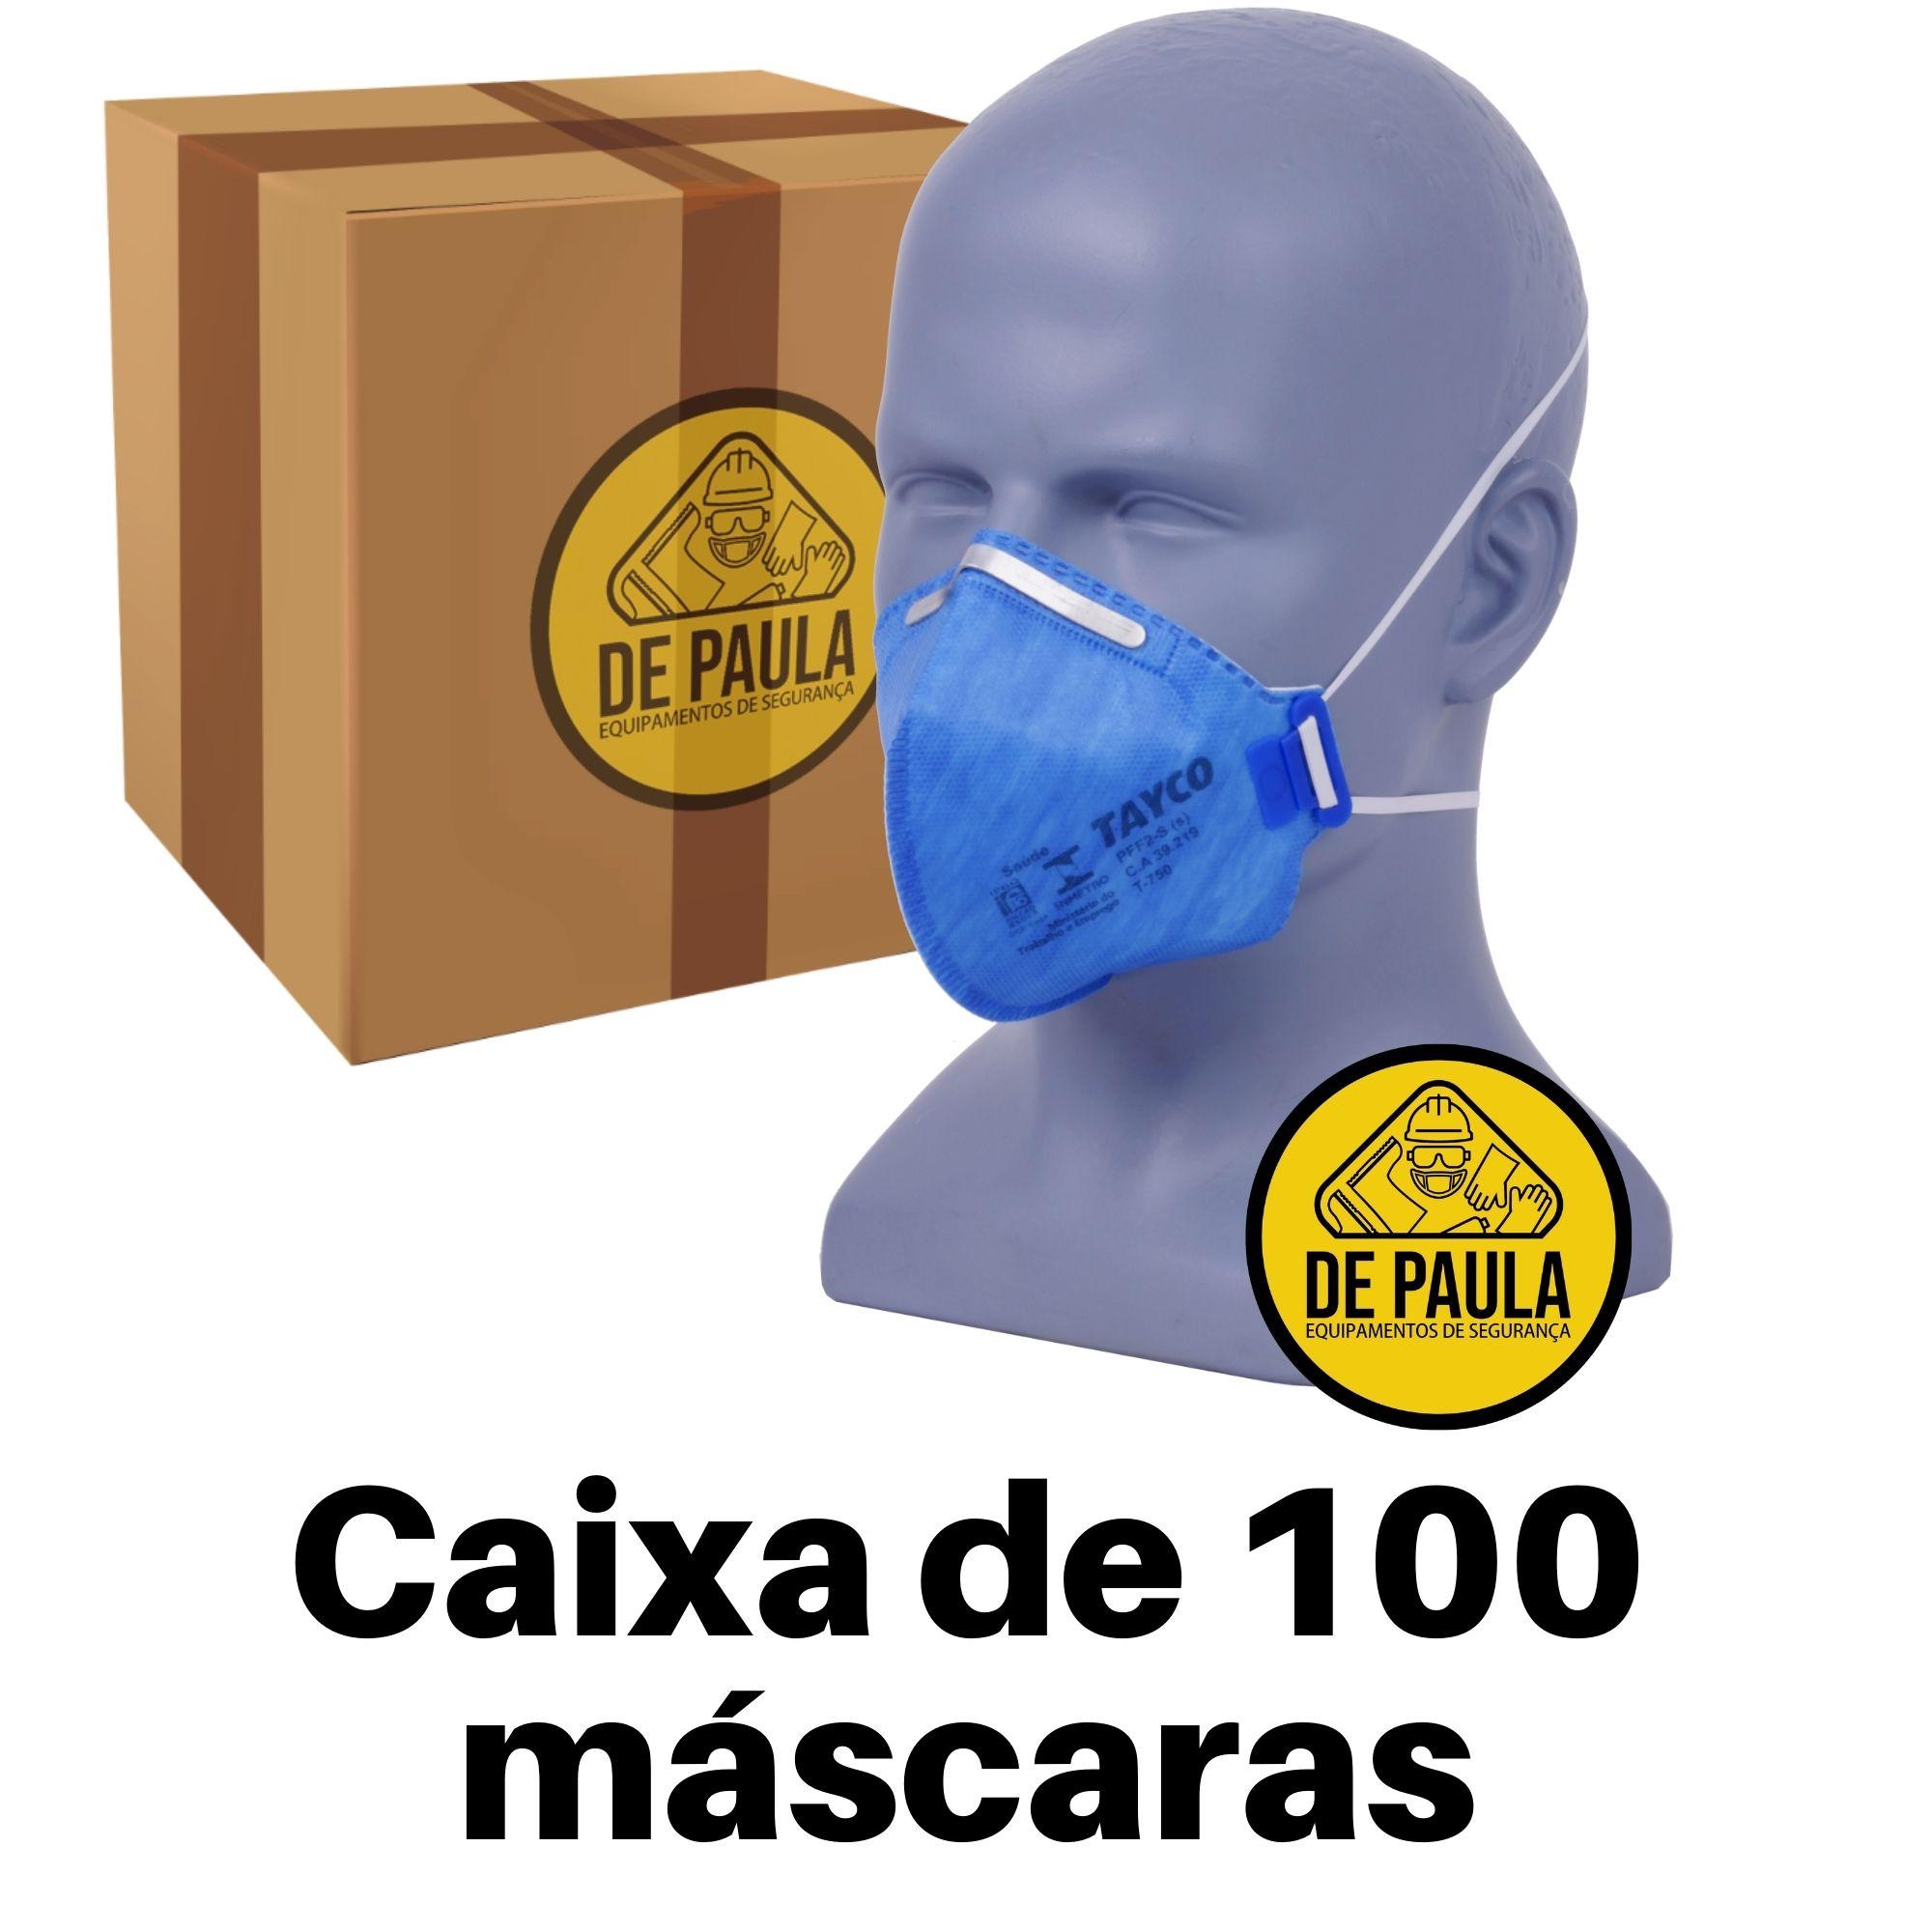 CAIXA DE 100 UN - MASCARA PFF2 -S SEM VÁLVULA AZUL TAYCO  - DE PAULA EPI